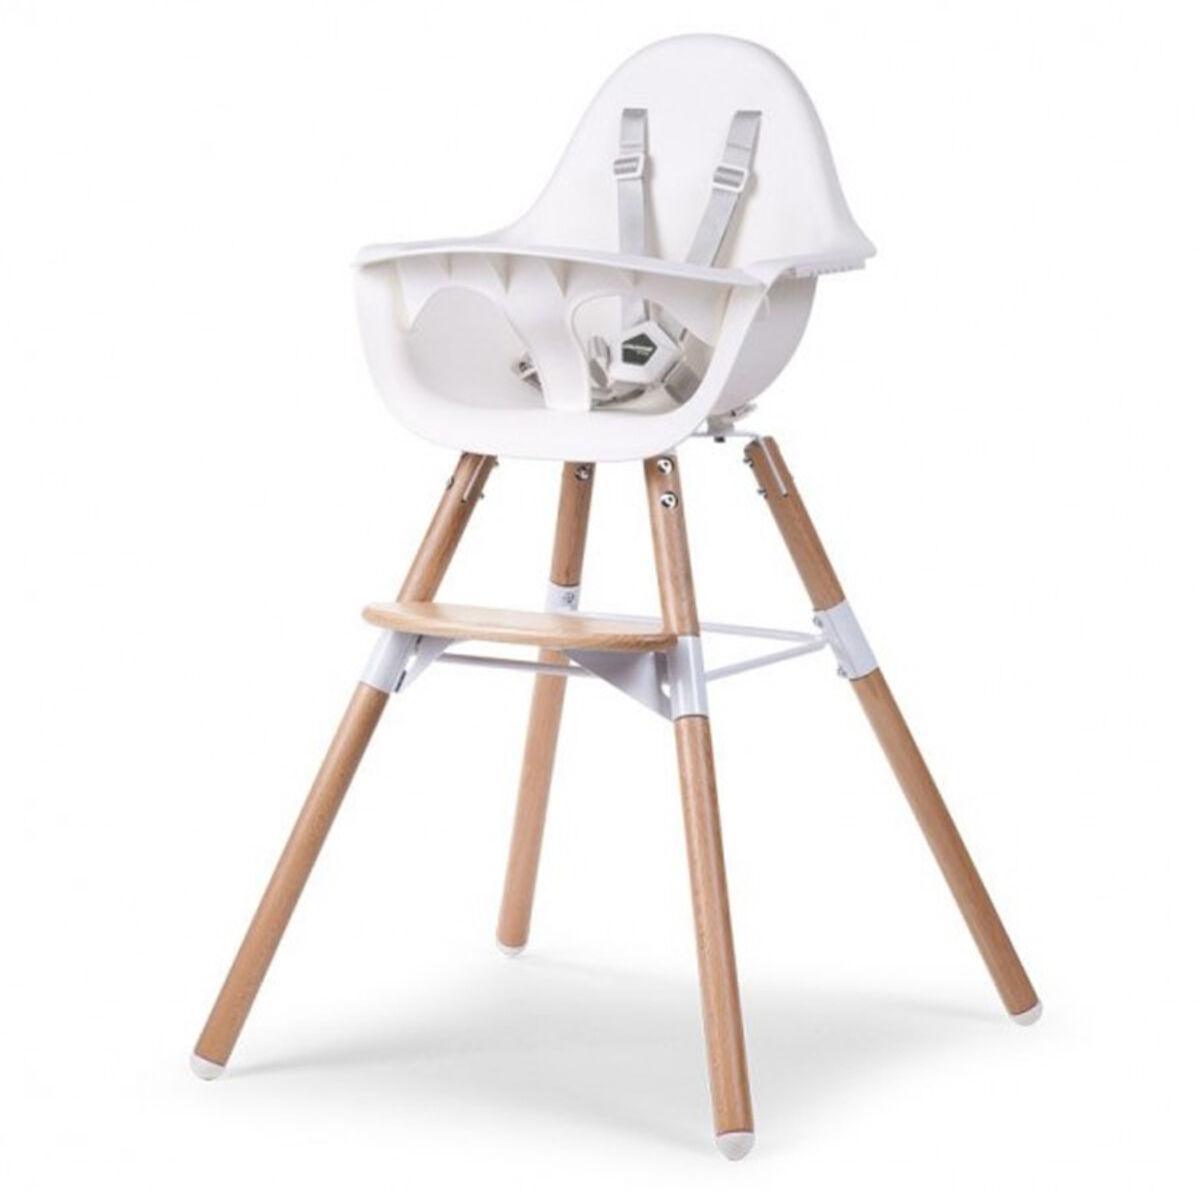 childhome chaise haute evolu 2 - bois et blanc